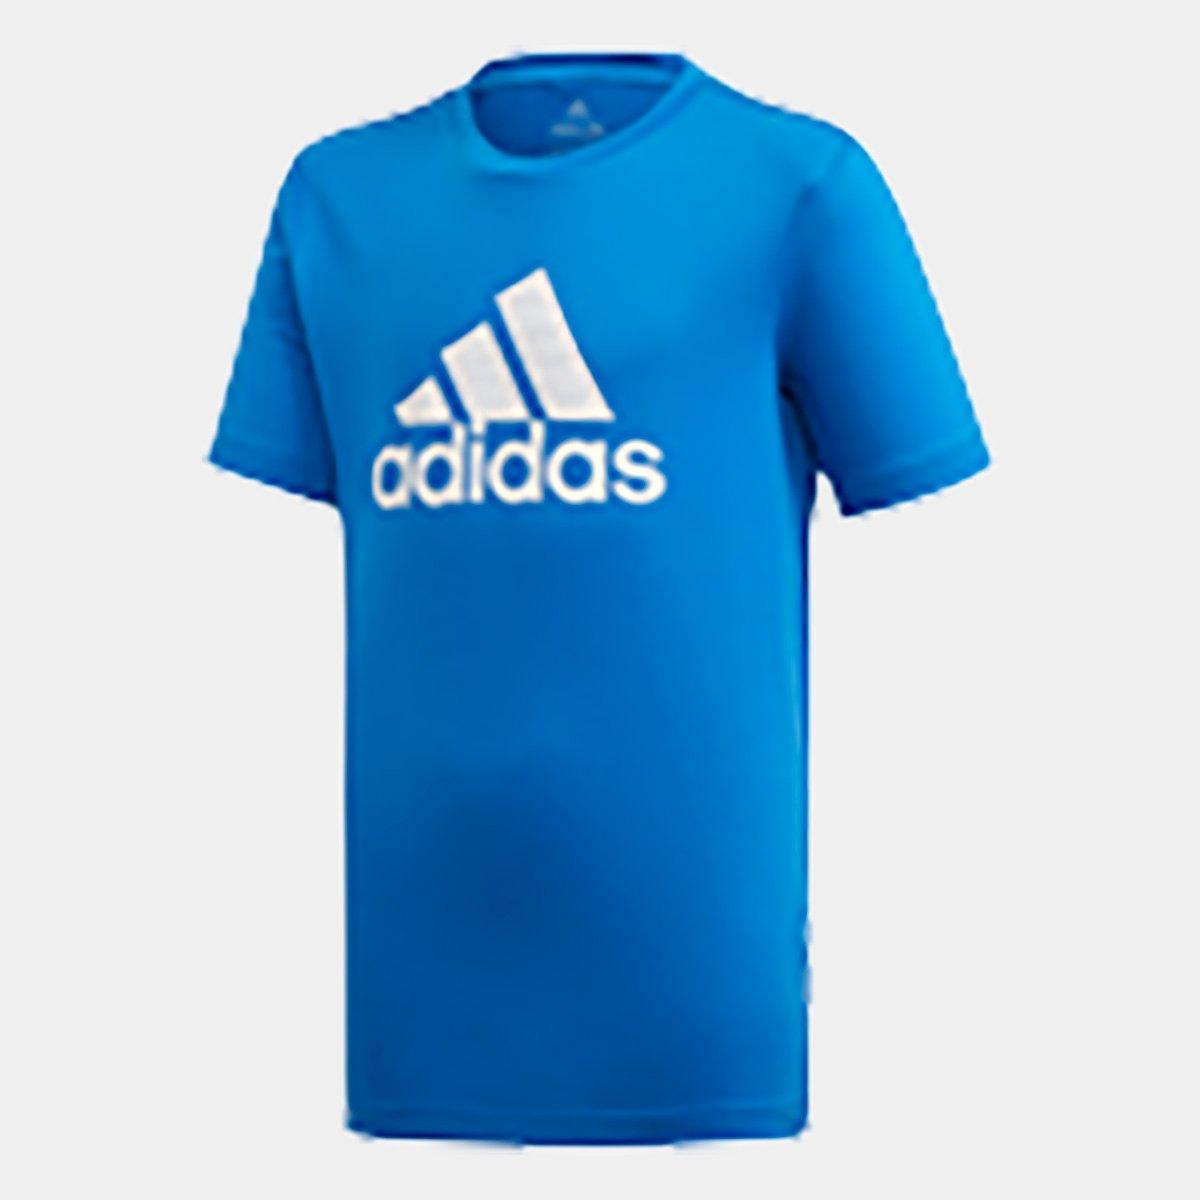 Camiseta Infantil Adidas Jb Tr Prime Masculina